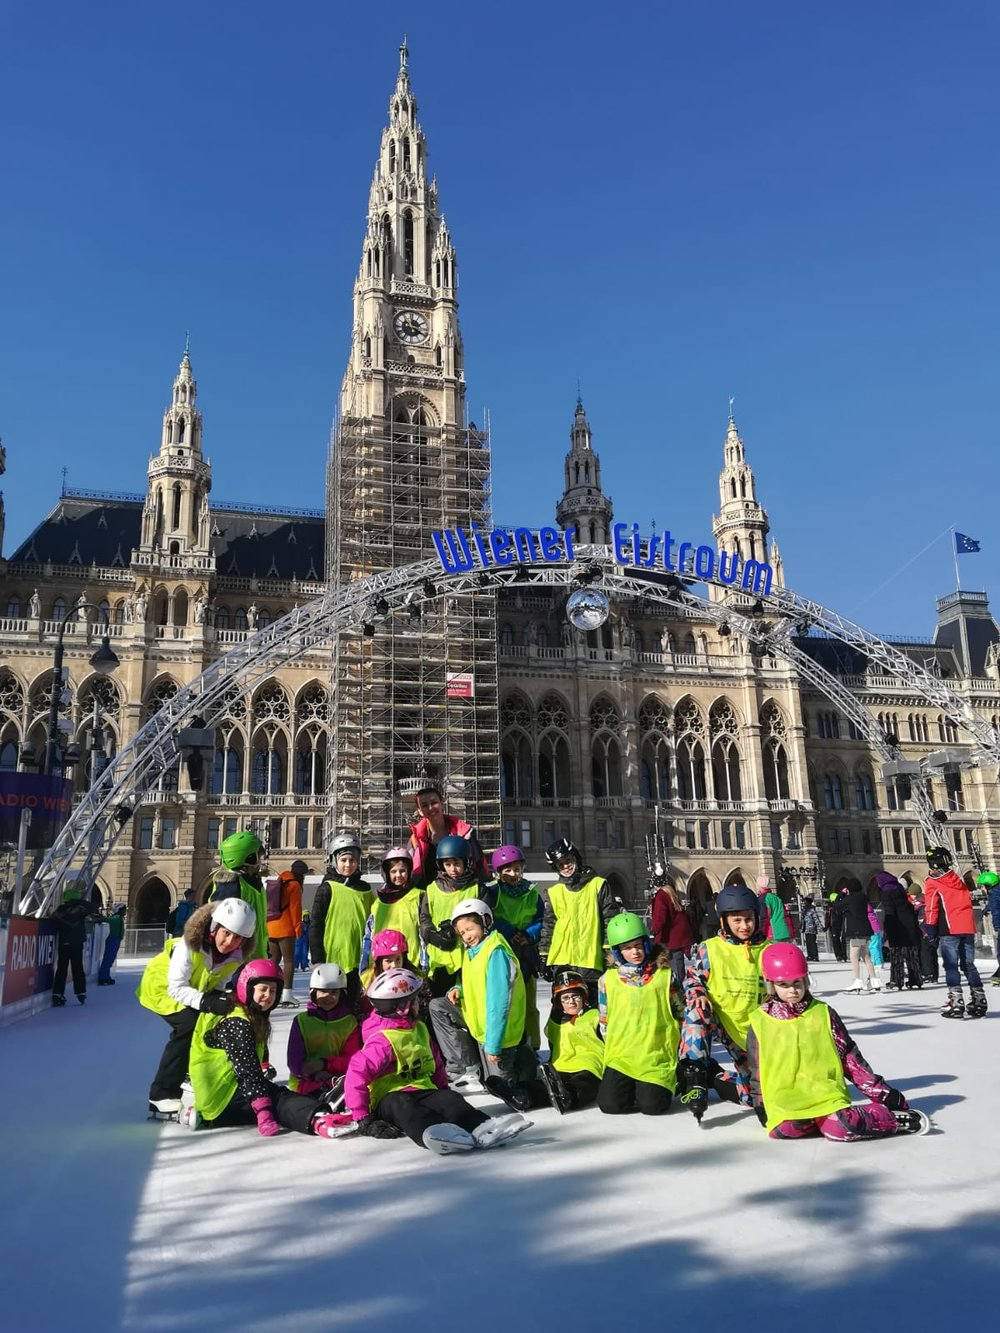 01.04.2019 - Vienna Ice-skating